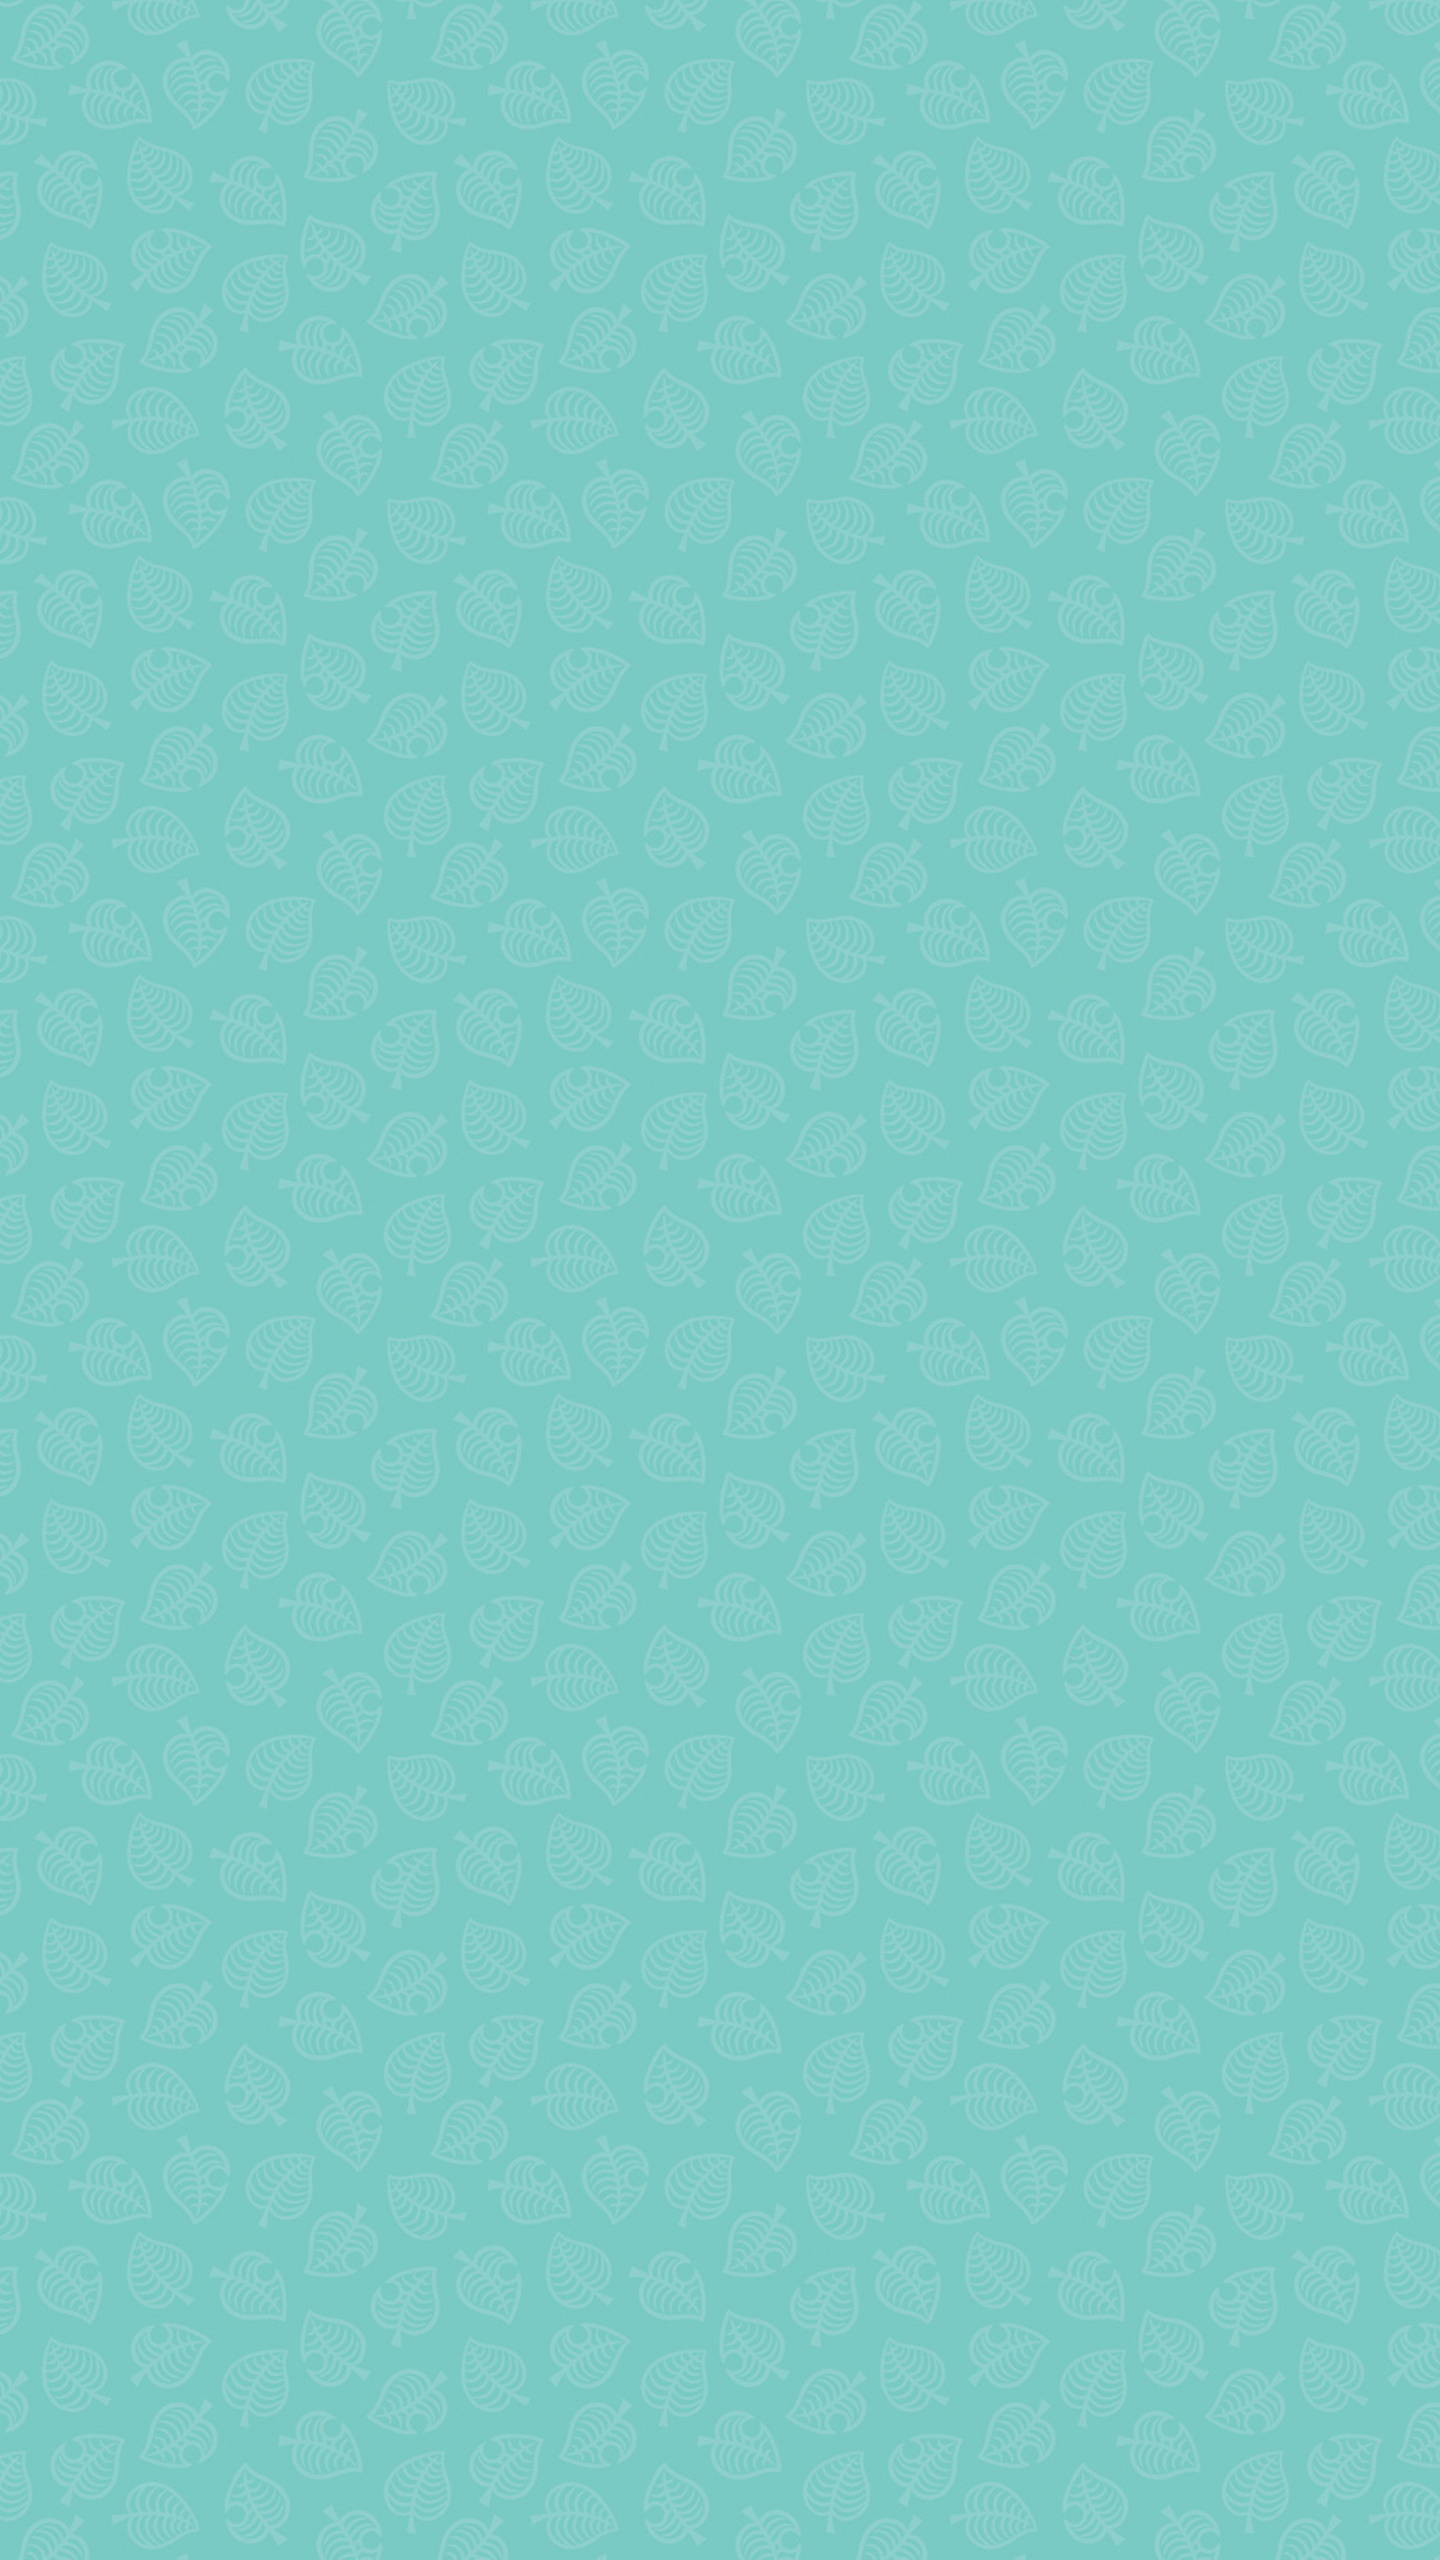 Animal Crossing New Horizons Leaf Pattern Version 3 Wallpaper